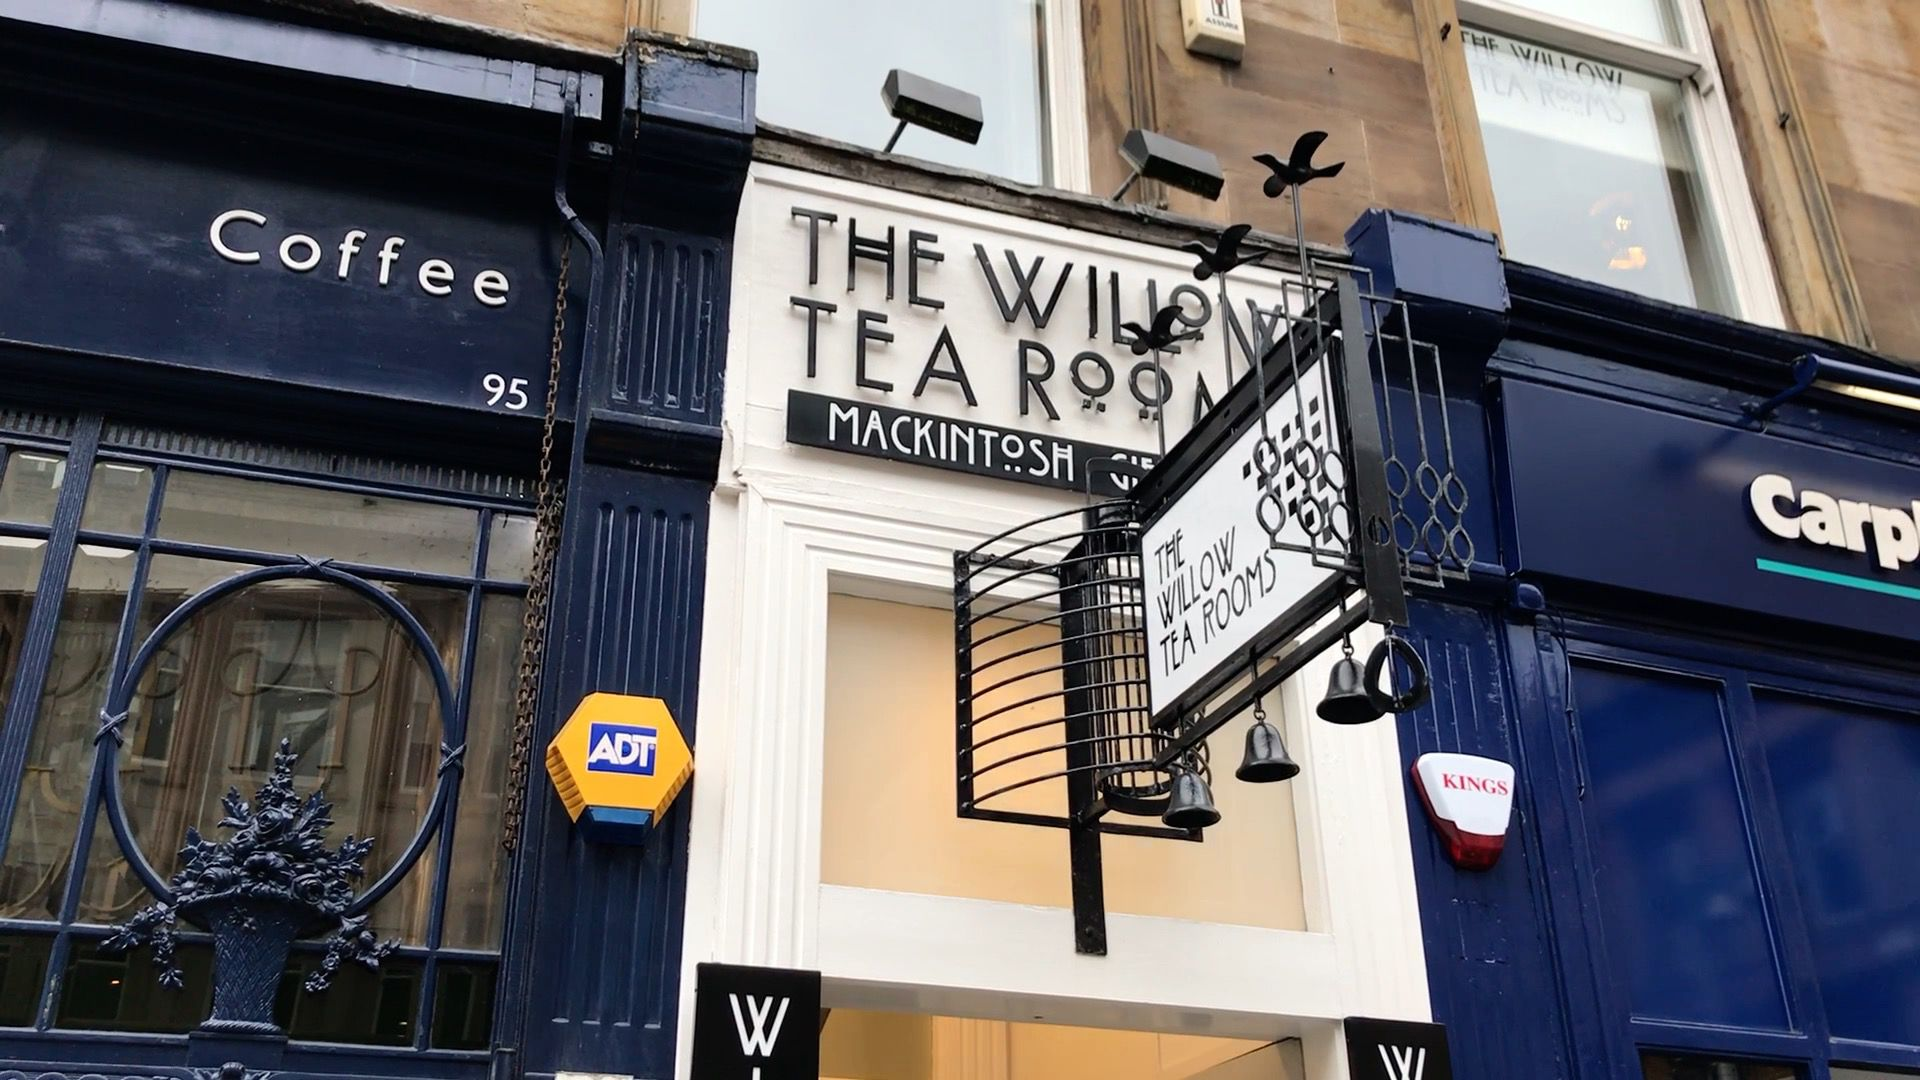 Glasgow - Willow tearooms